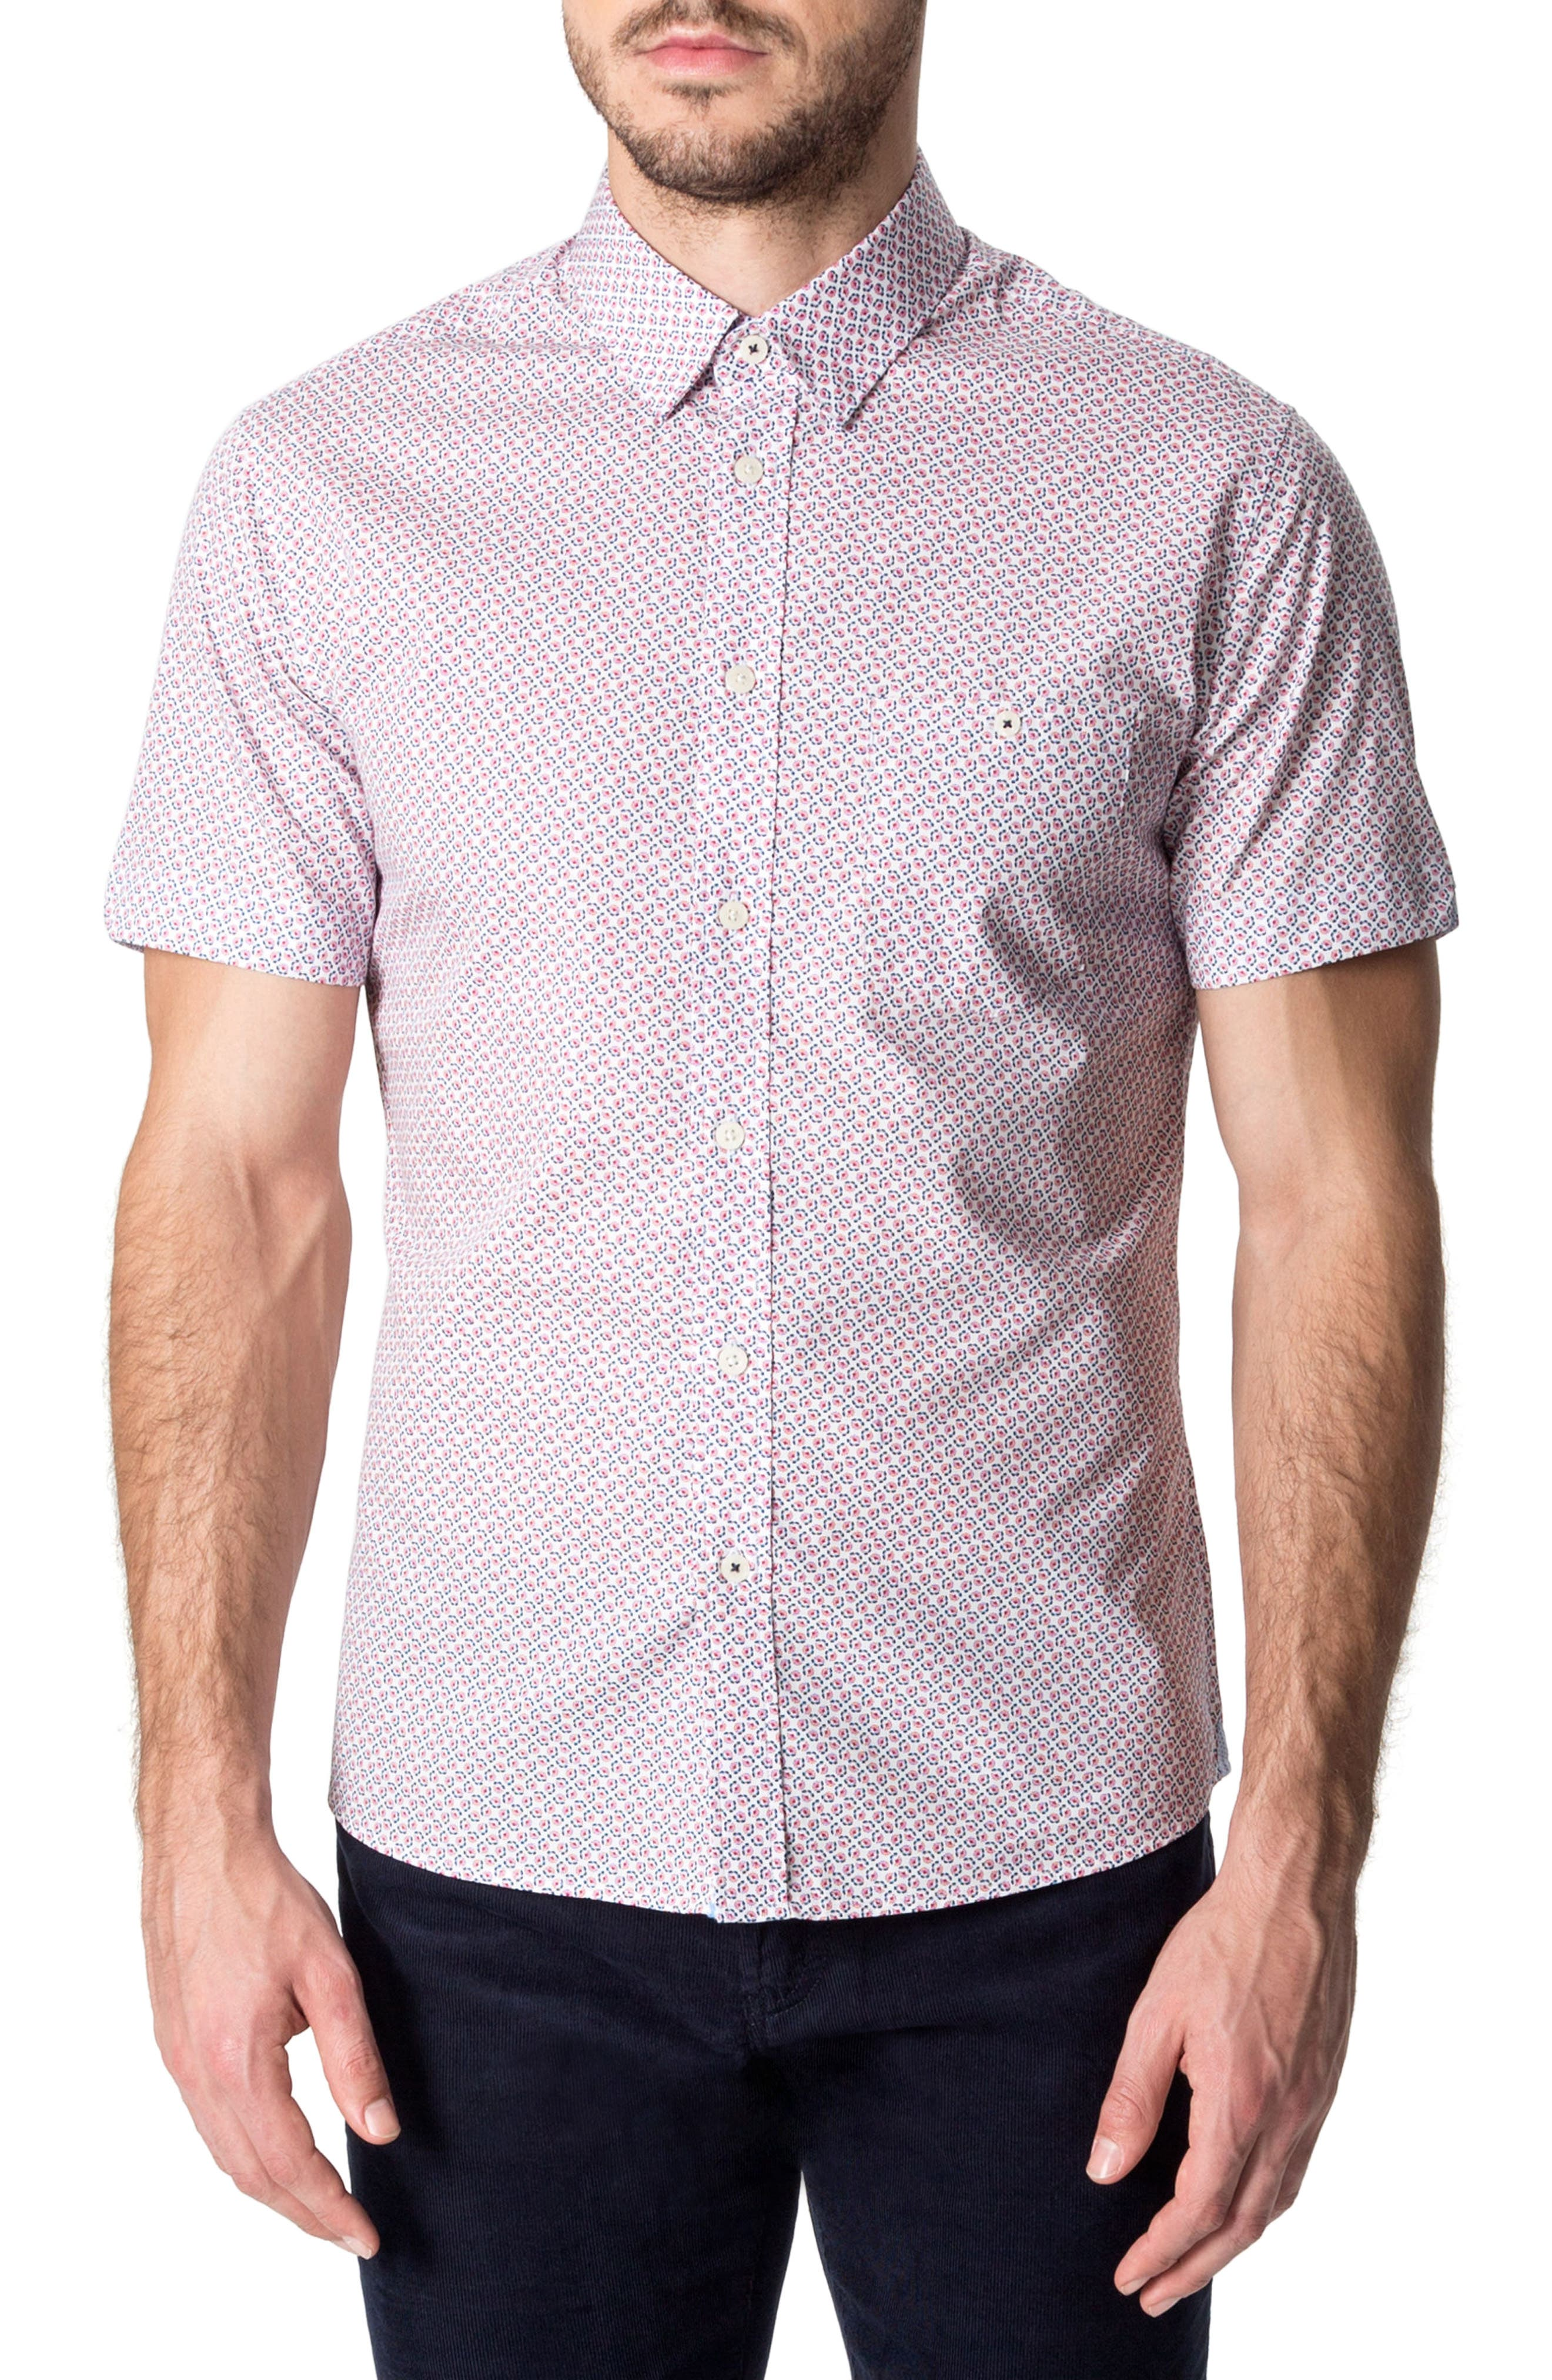 Funky Fire Woven Shirt,                             Main thumbnail 1, color,                             600